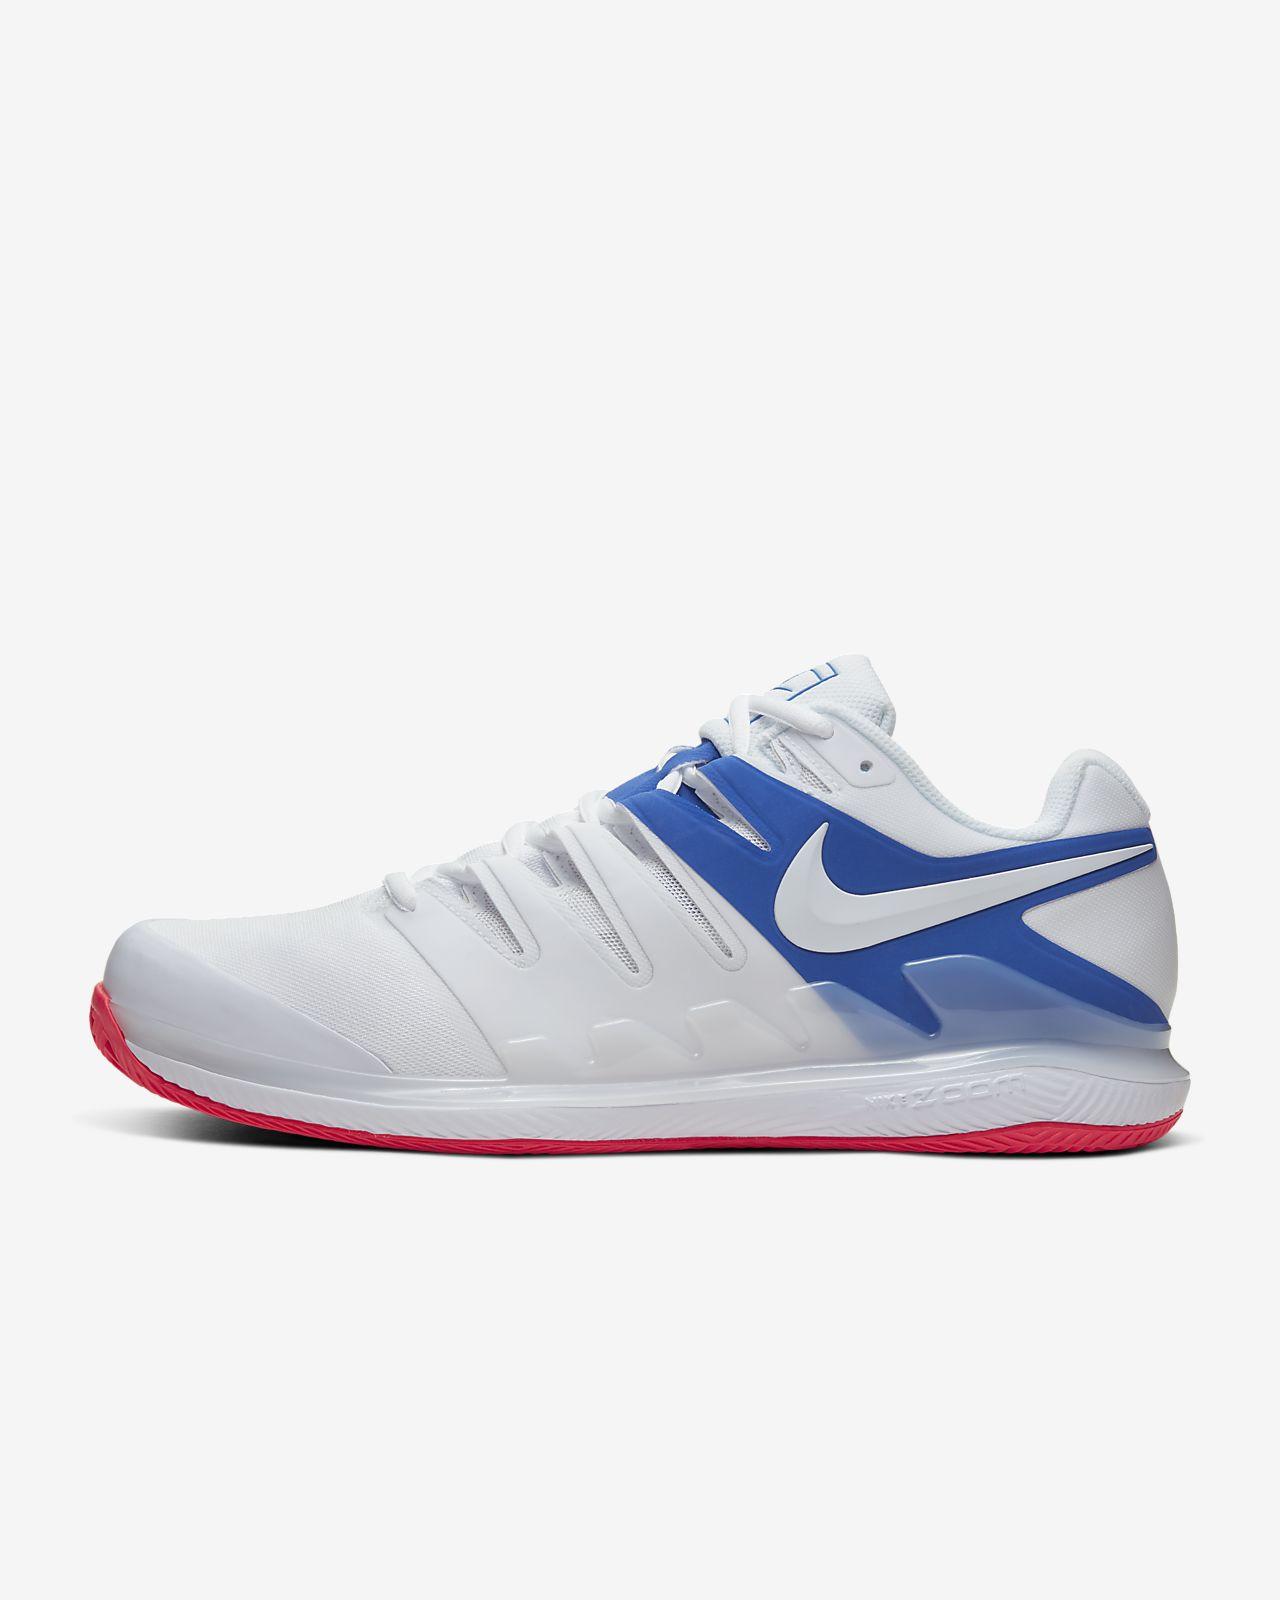 buying new clearance sale shoes for cheap NikeCourt Air Zoom Vapor X Herren-Tennisschuh für Sandplätze